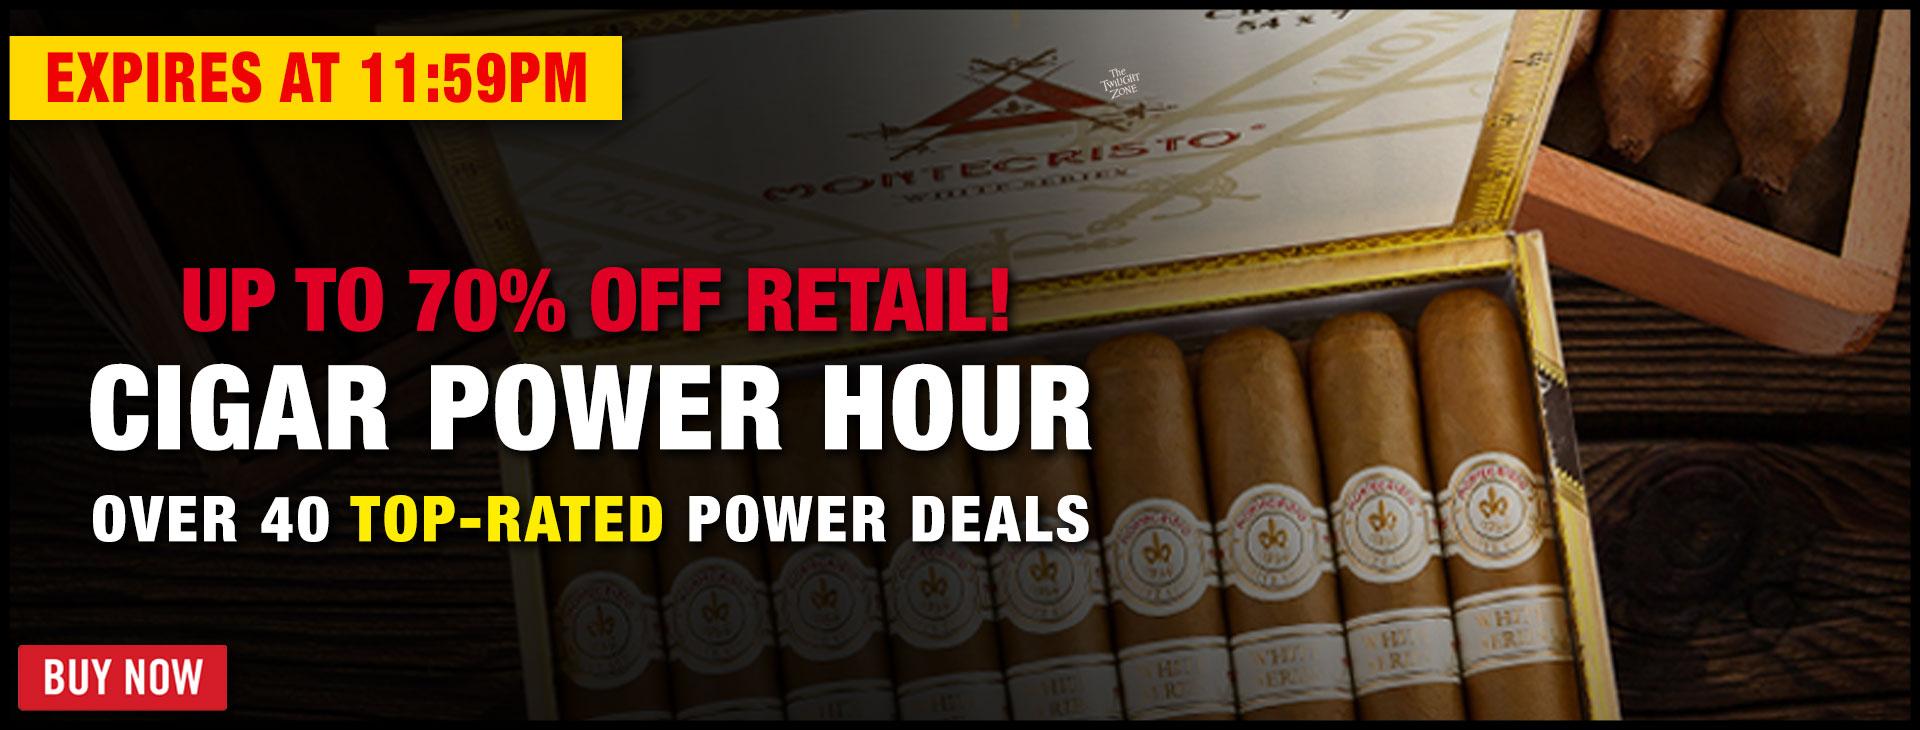 cigar-power-hour-2021-banner.jpg